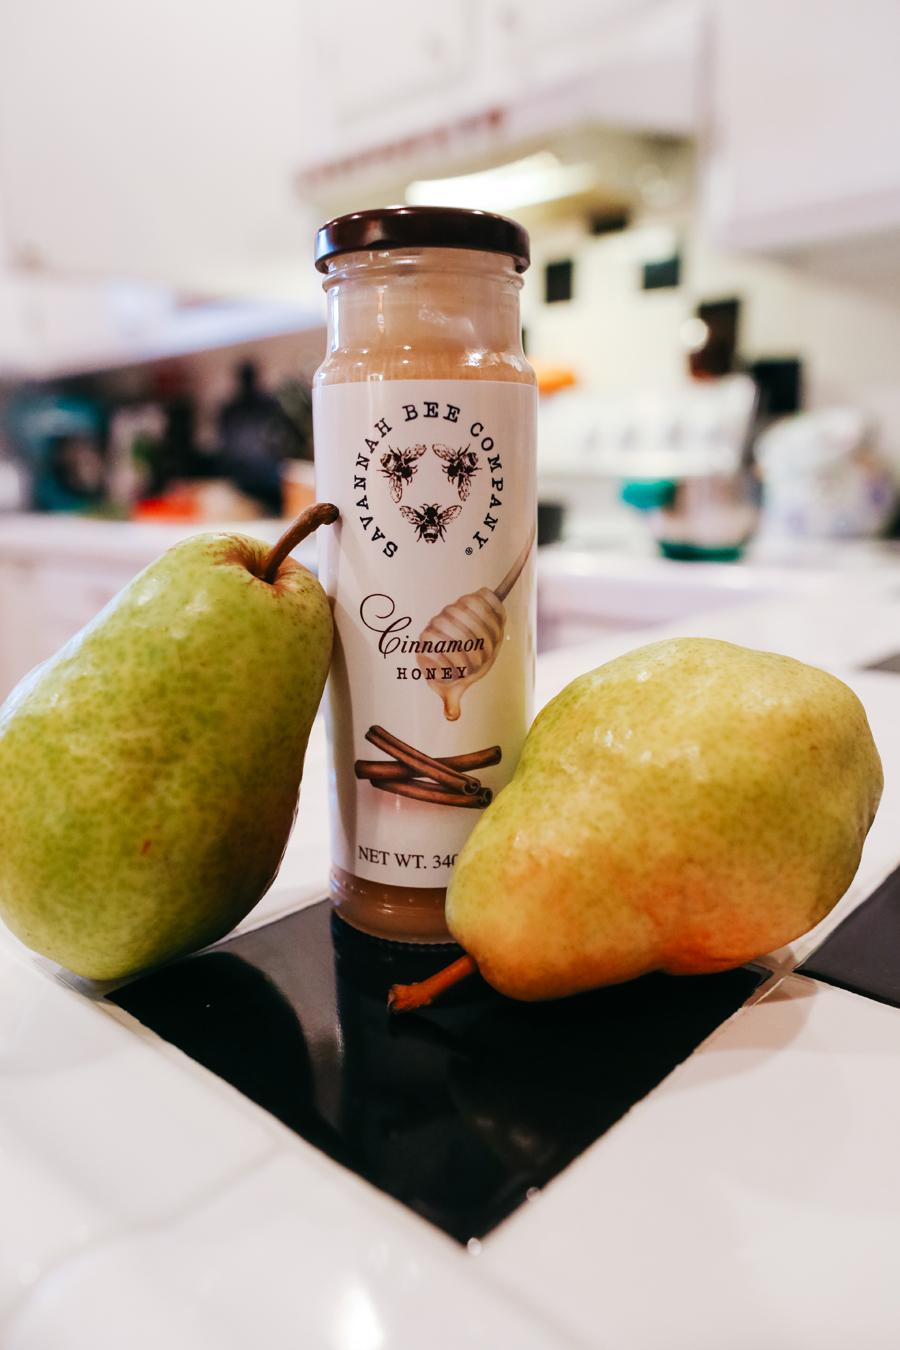 002-katheryn-moran-photography-sous-vide-pear-dessert.jpg